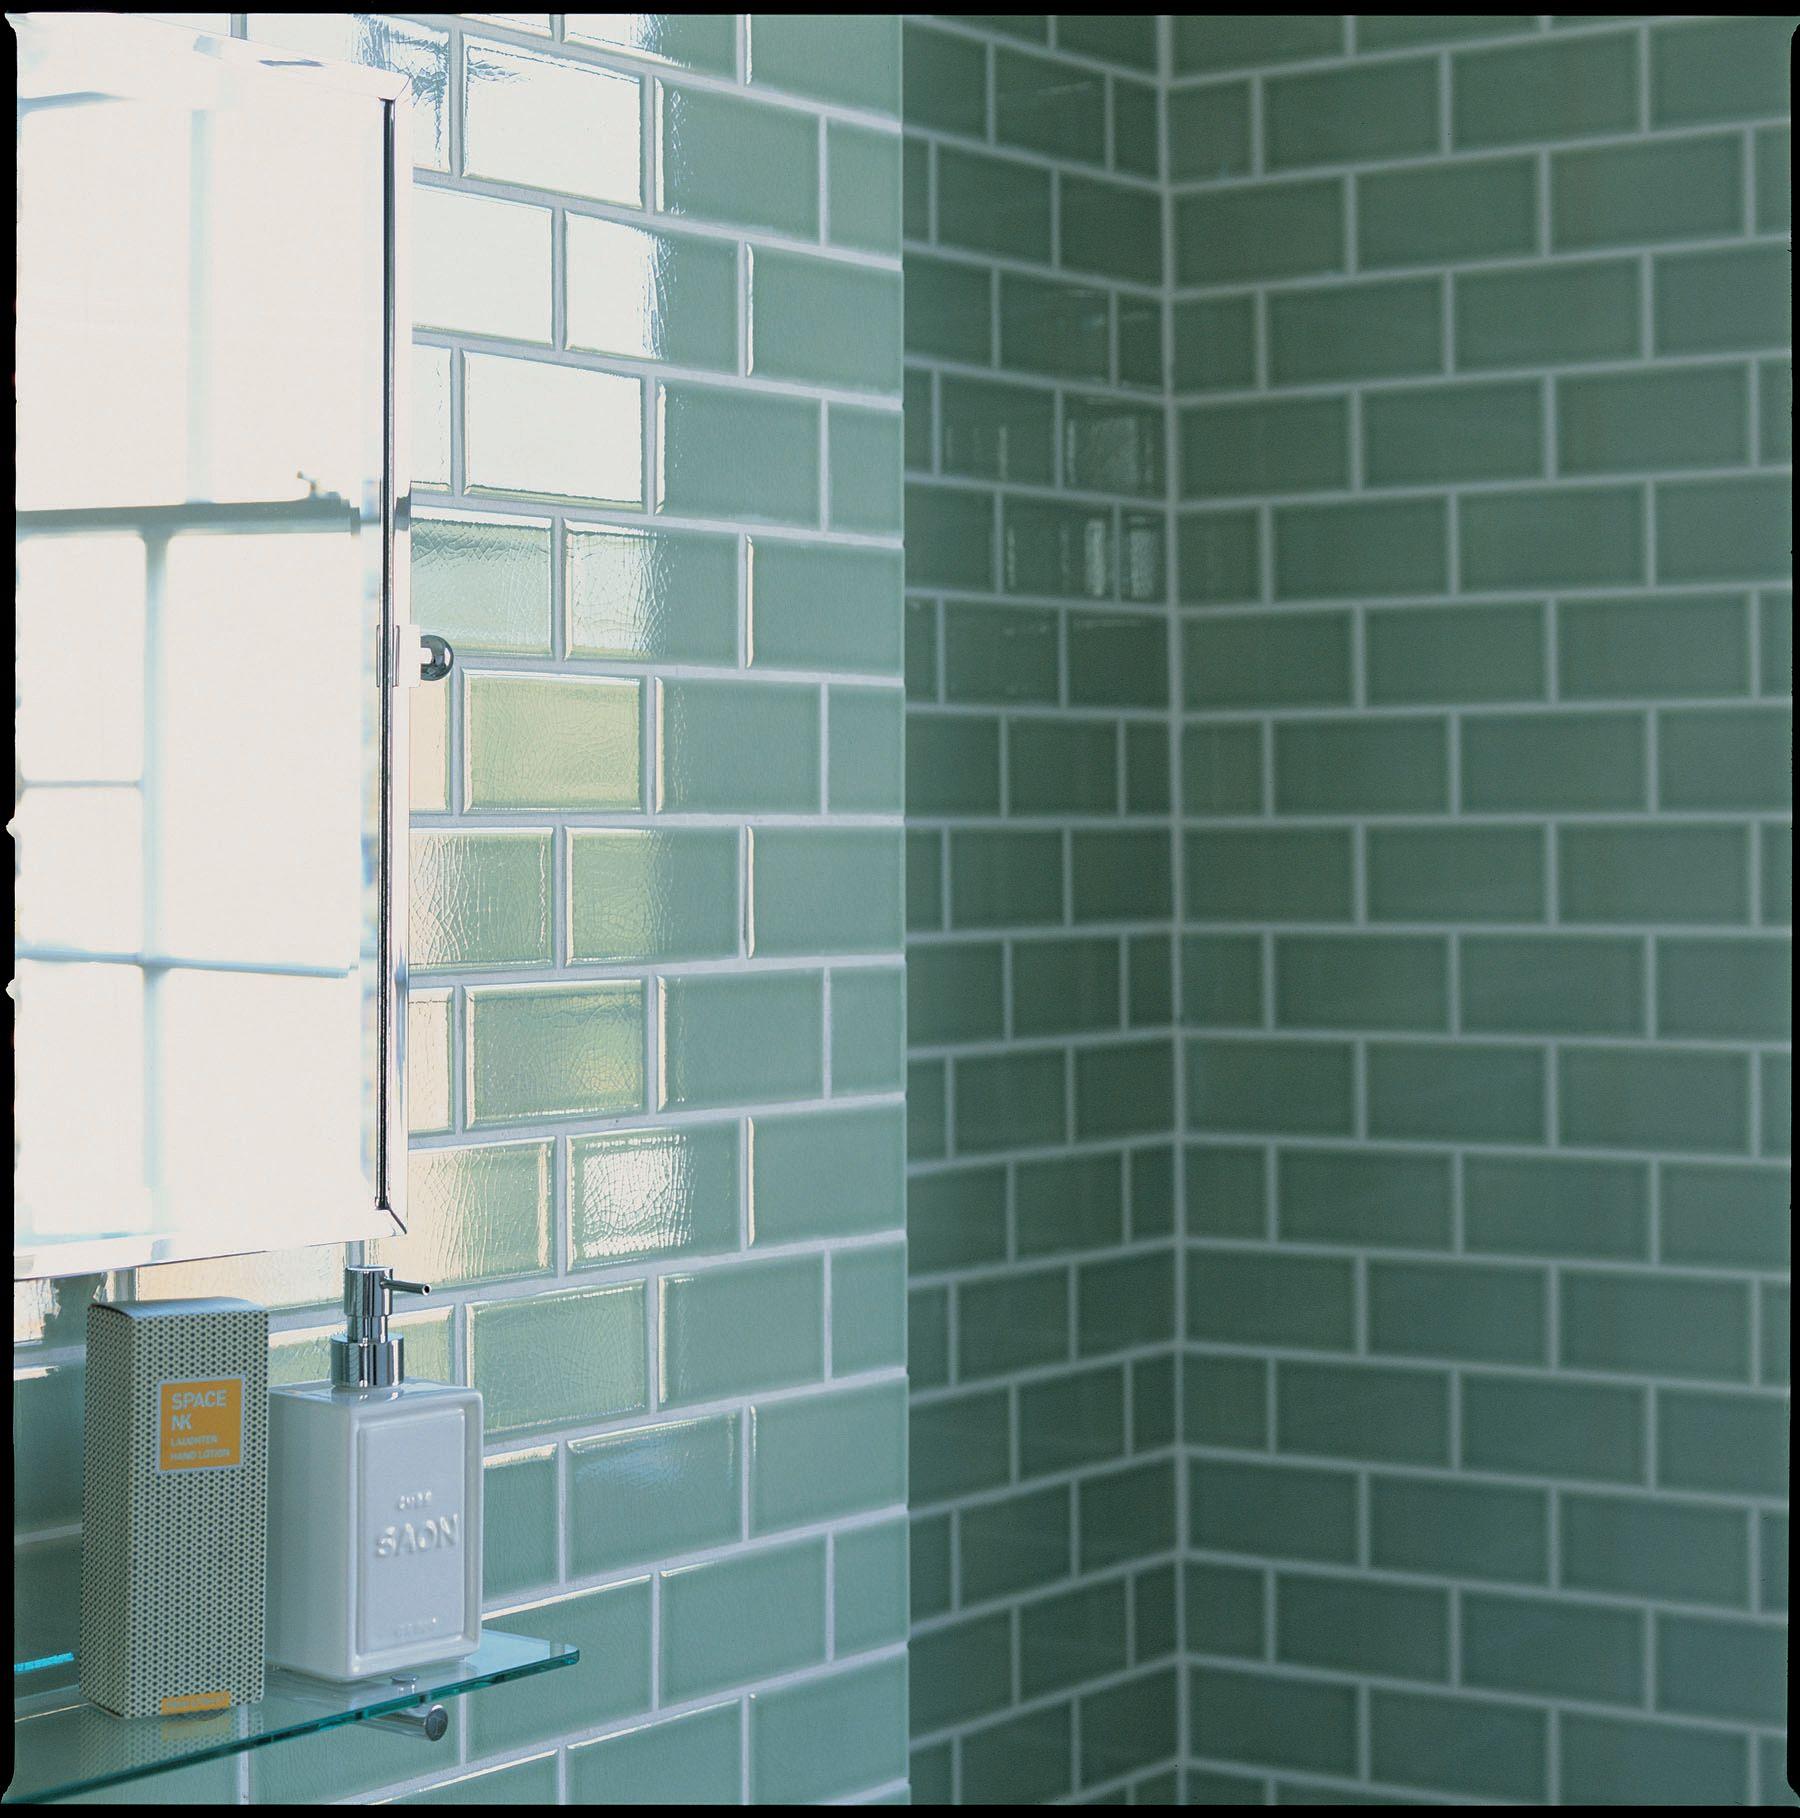 Buy Bathroom Tiles: Best 25+ Green Bathroom Tiles Ideas On Pinterest